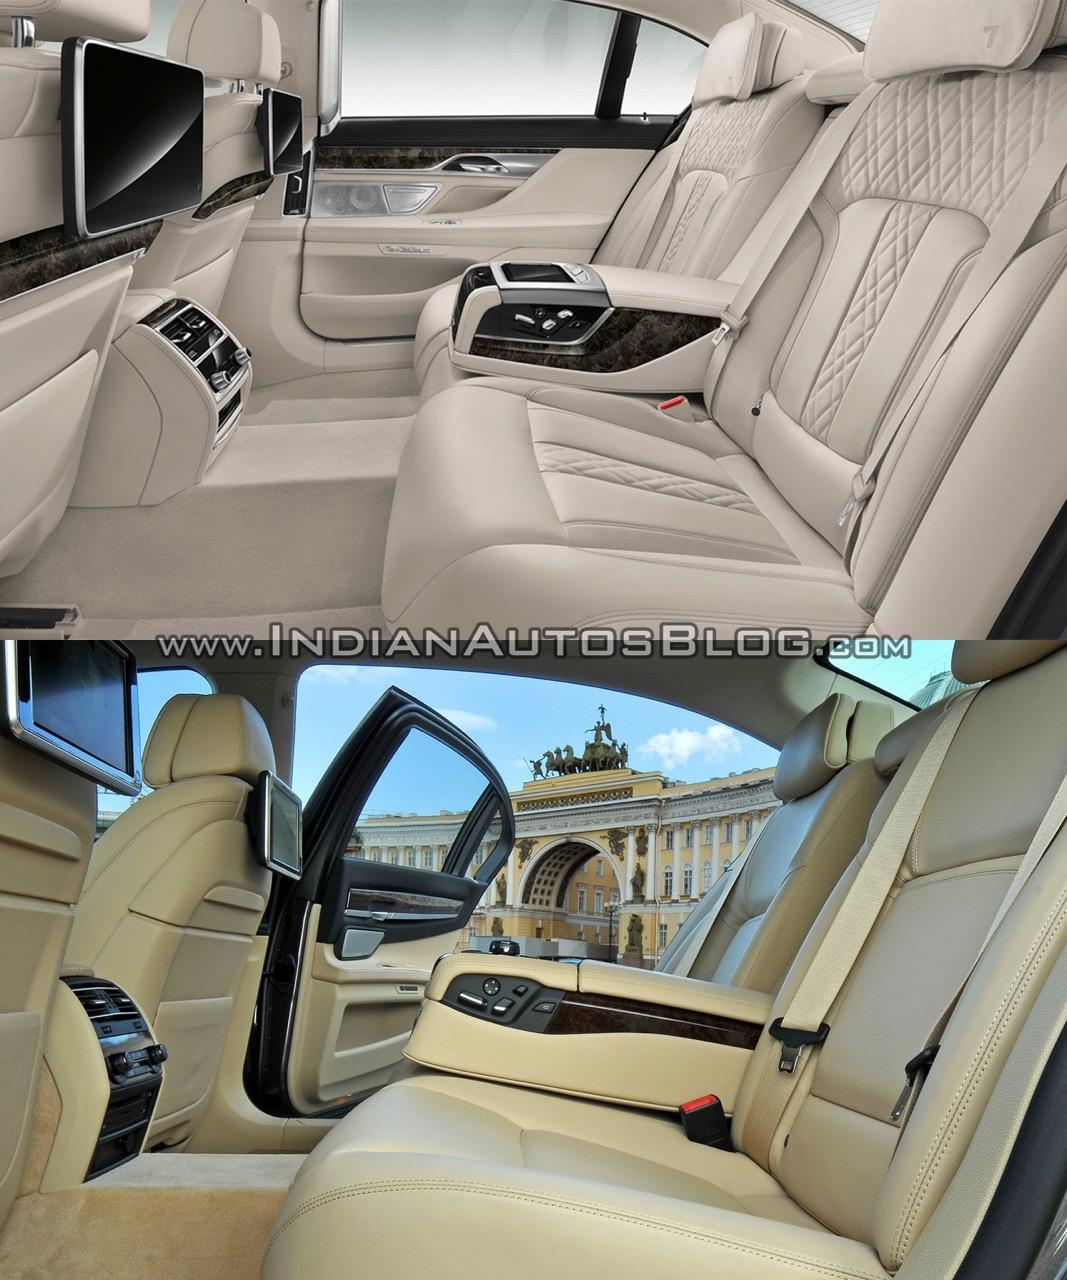 2016 BMW 7 Series vs 2014 BMW 7 Series rear cabin Old vs New